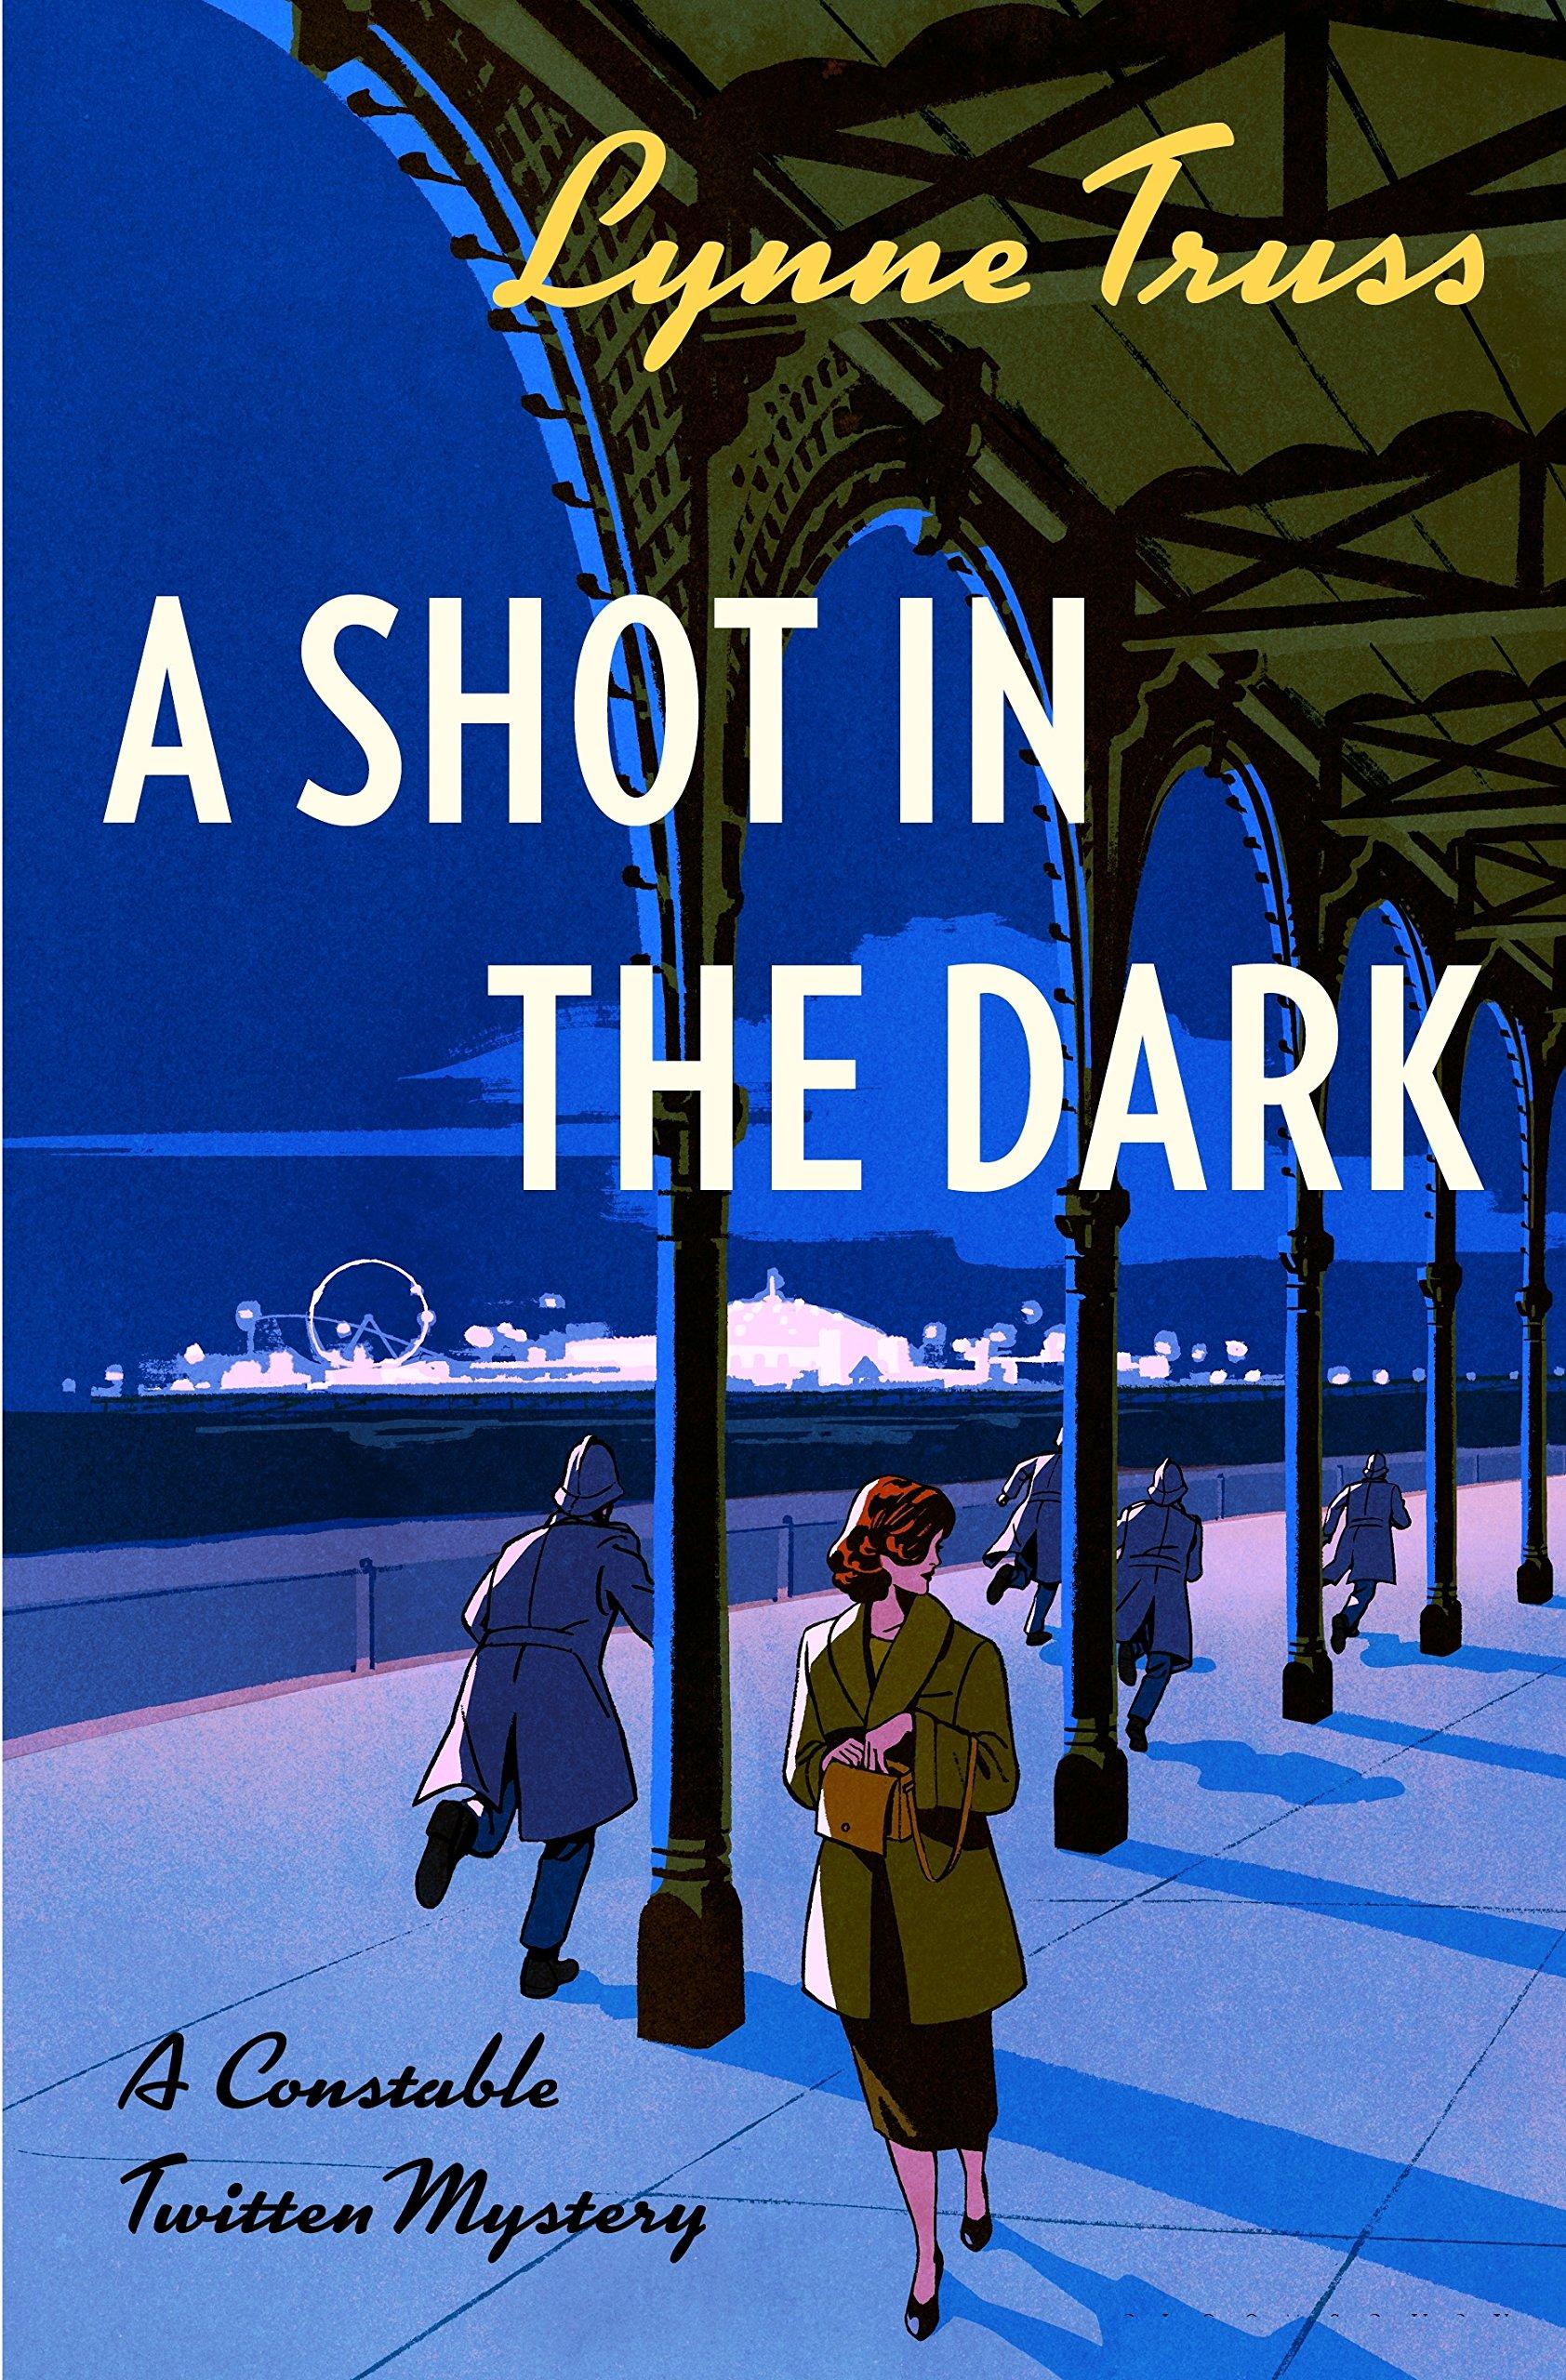 a shot in the dark (1).jpg